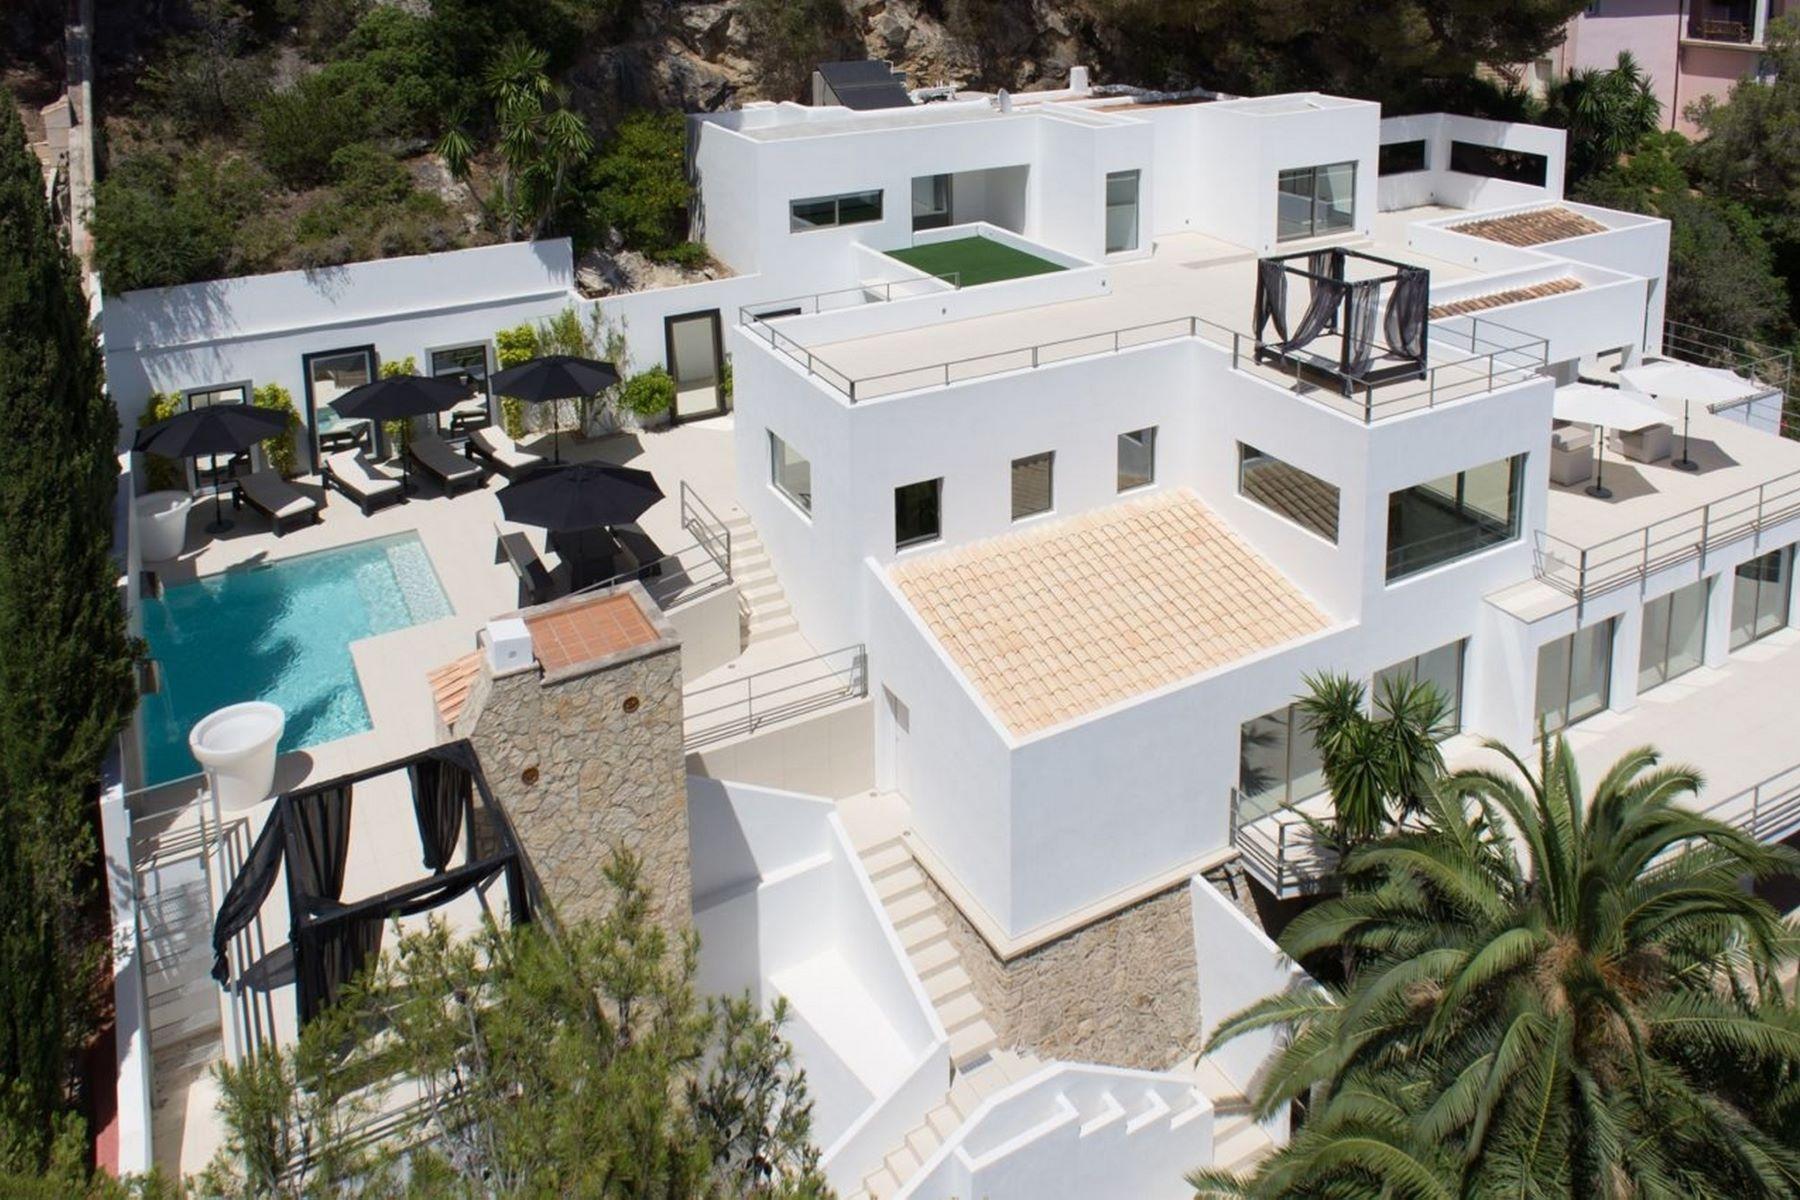 Single Family Home for Sale at Villa with sea views in Son Vida Palma De Mallorca, Balearic Islands, 07181 Spain